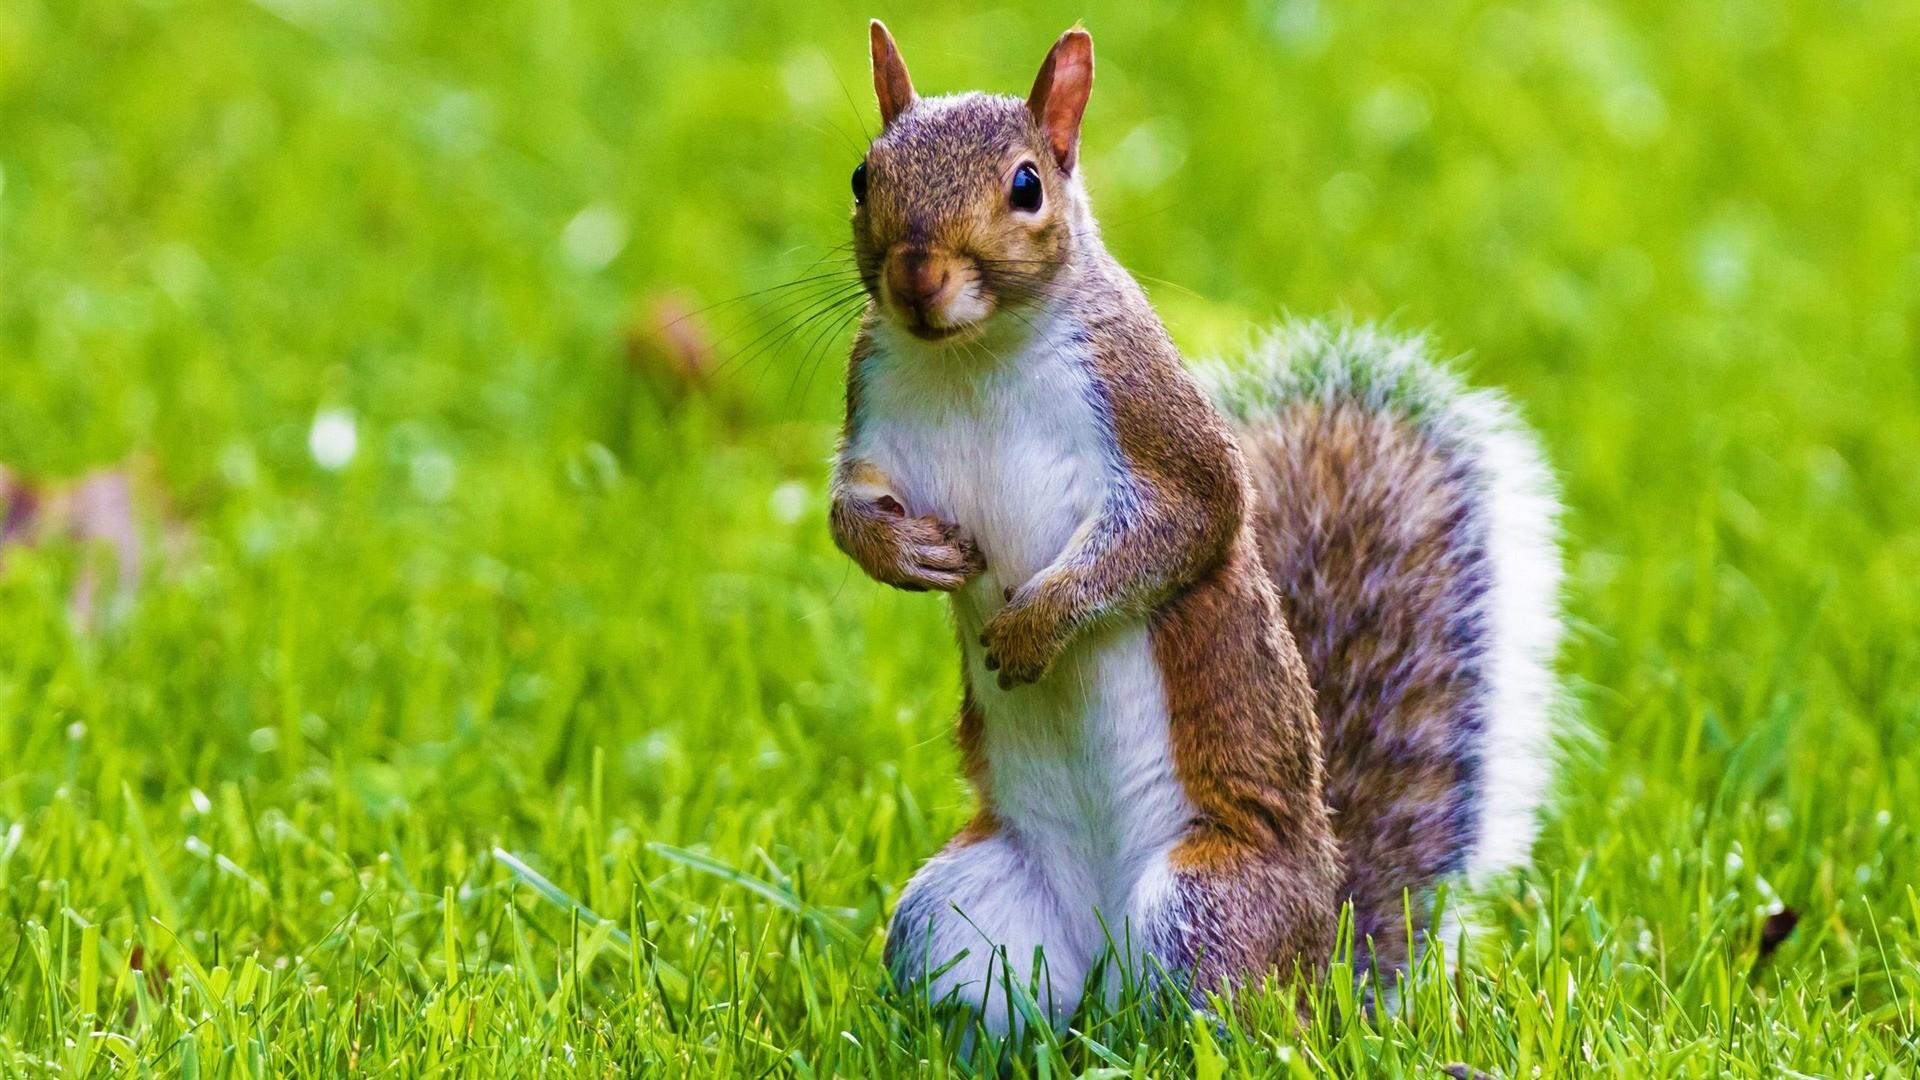 Cute Squirrel Wild Animal Desktop Wallpaper 1920×1080. Cute Animal .